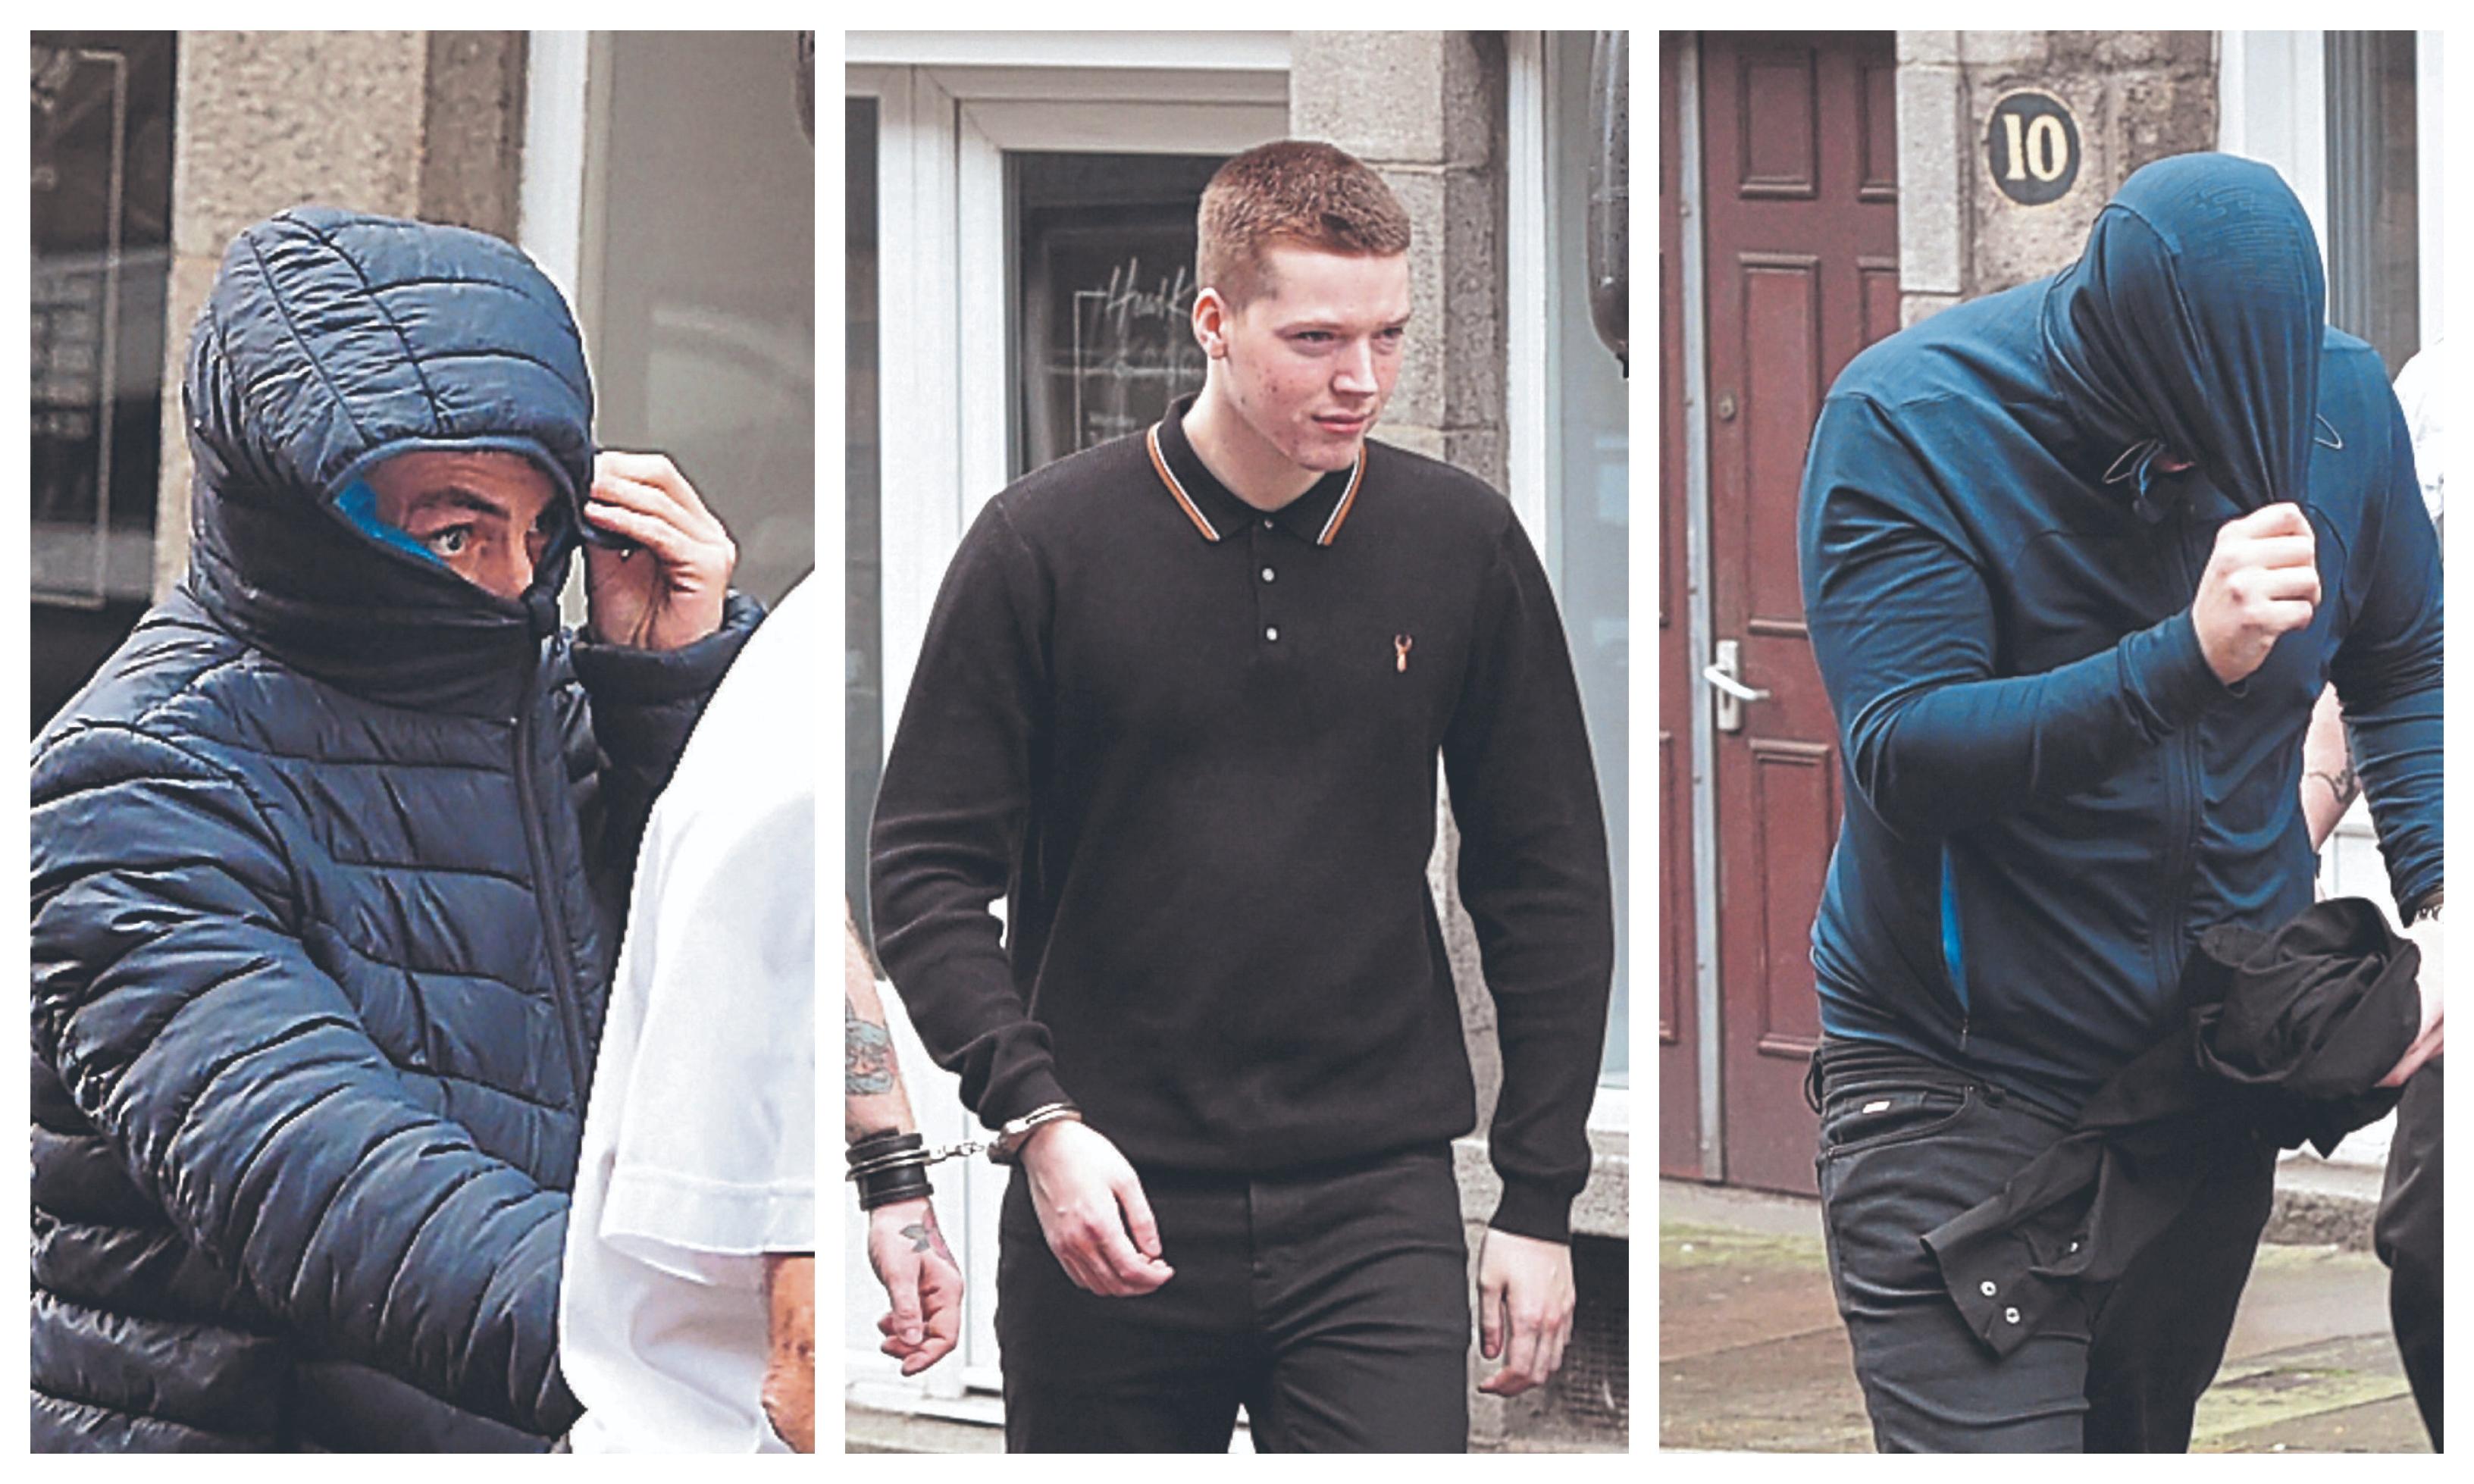 Martin Gemmell, Brandon Douglas and Brandon Wilson at court.